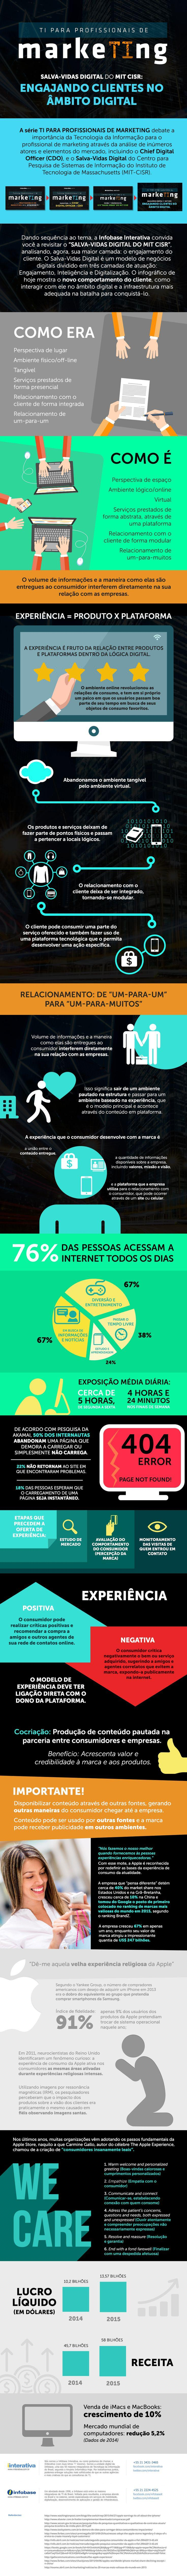 Infográfico – Salva-vidas Digital do MIT CISR: Engajando Clientes no Âmbito Digital  via:iinterativa  #marketindigital #brasil #modernistablog